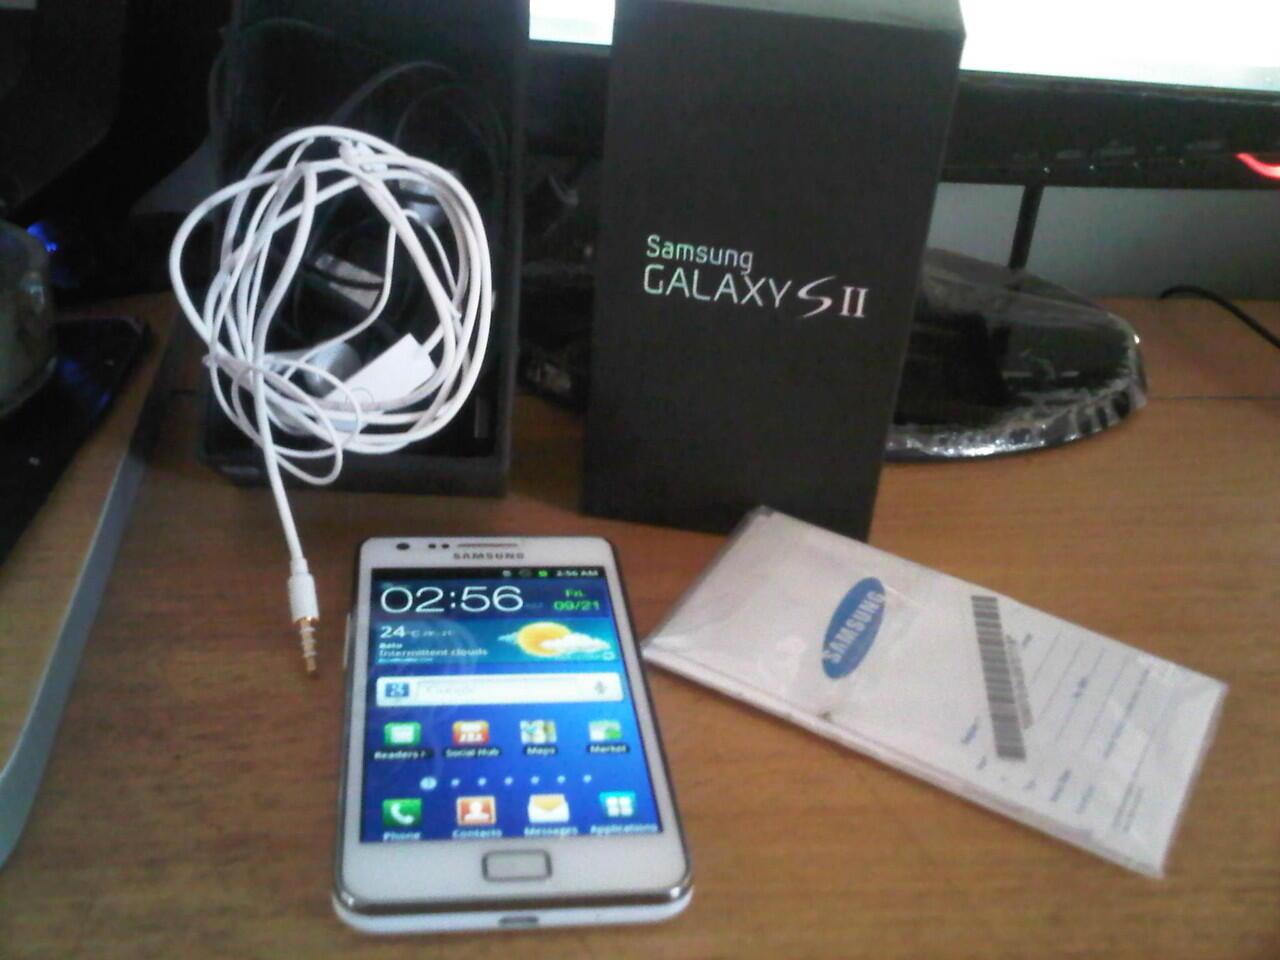 Samsung Galaxy SII GT-i9100 Putih Mulus Paling murah Se Malang raya